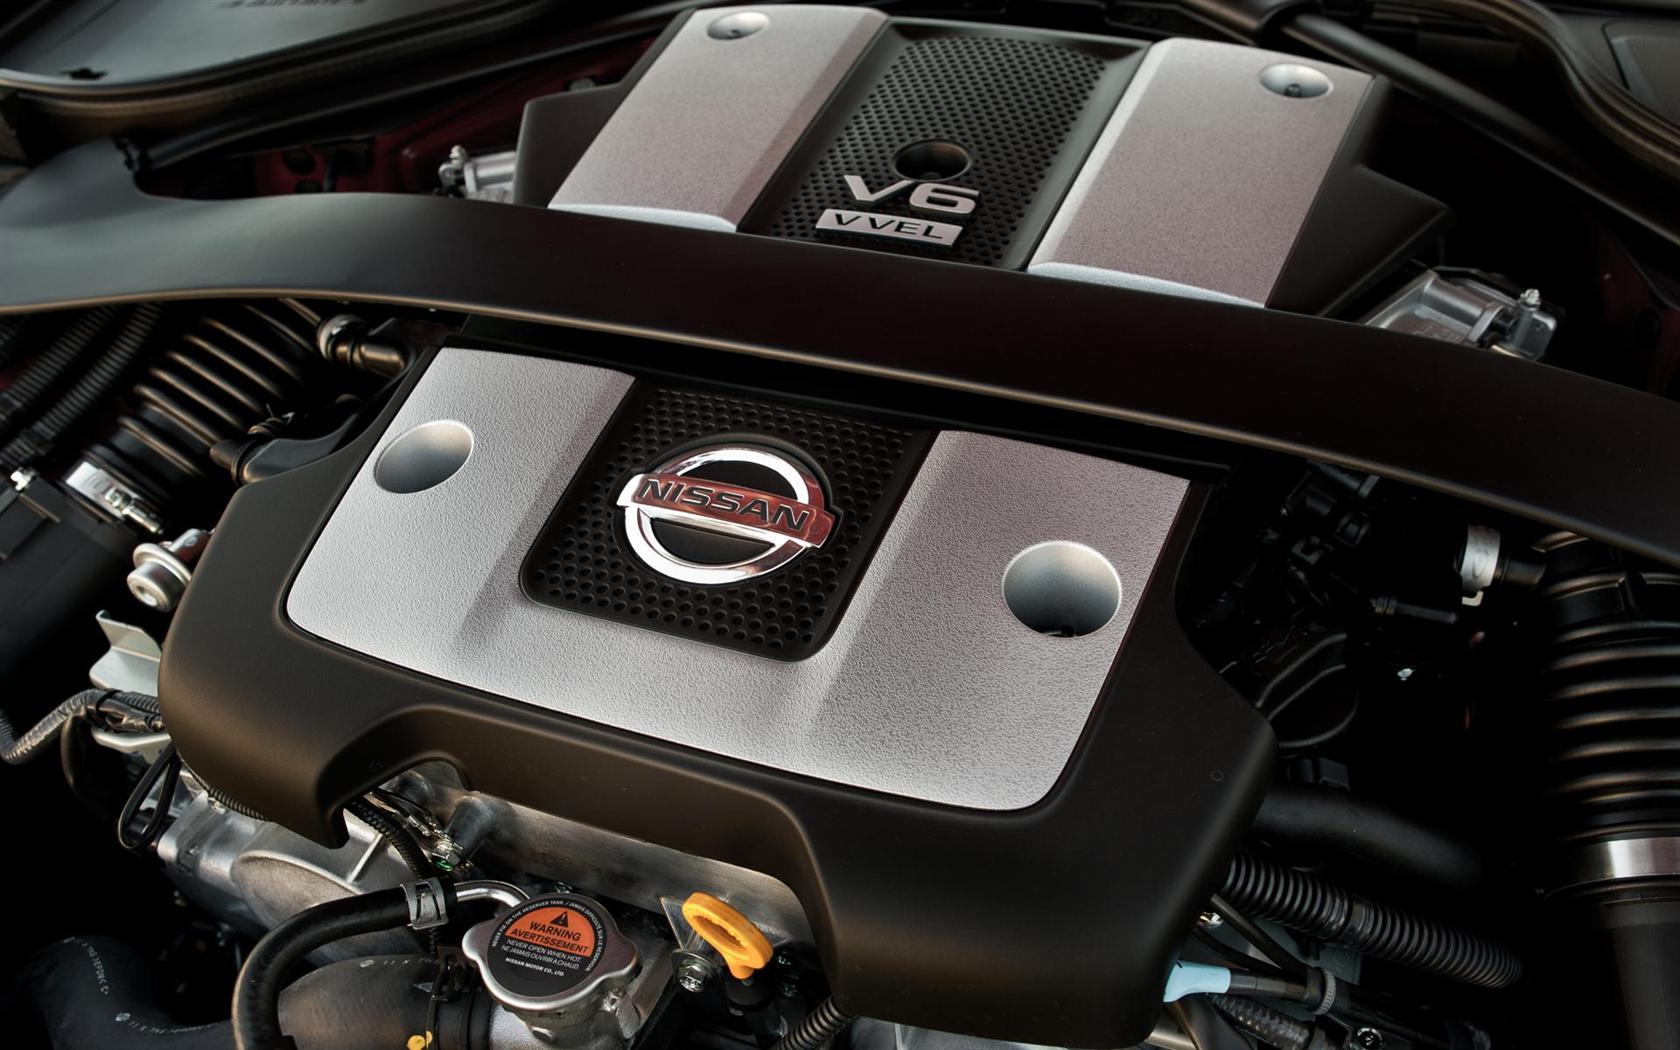 2014 Nissan 370Z Image. Photo 14 of 28